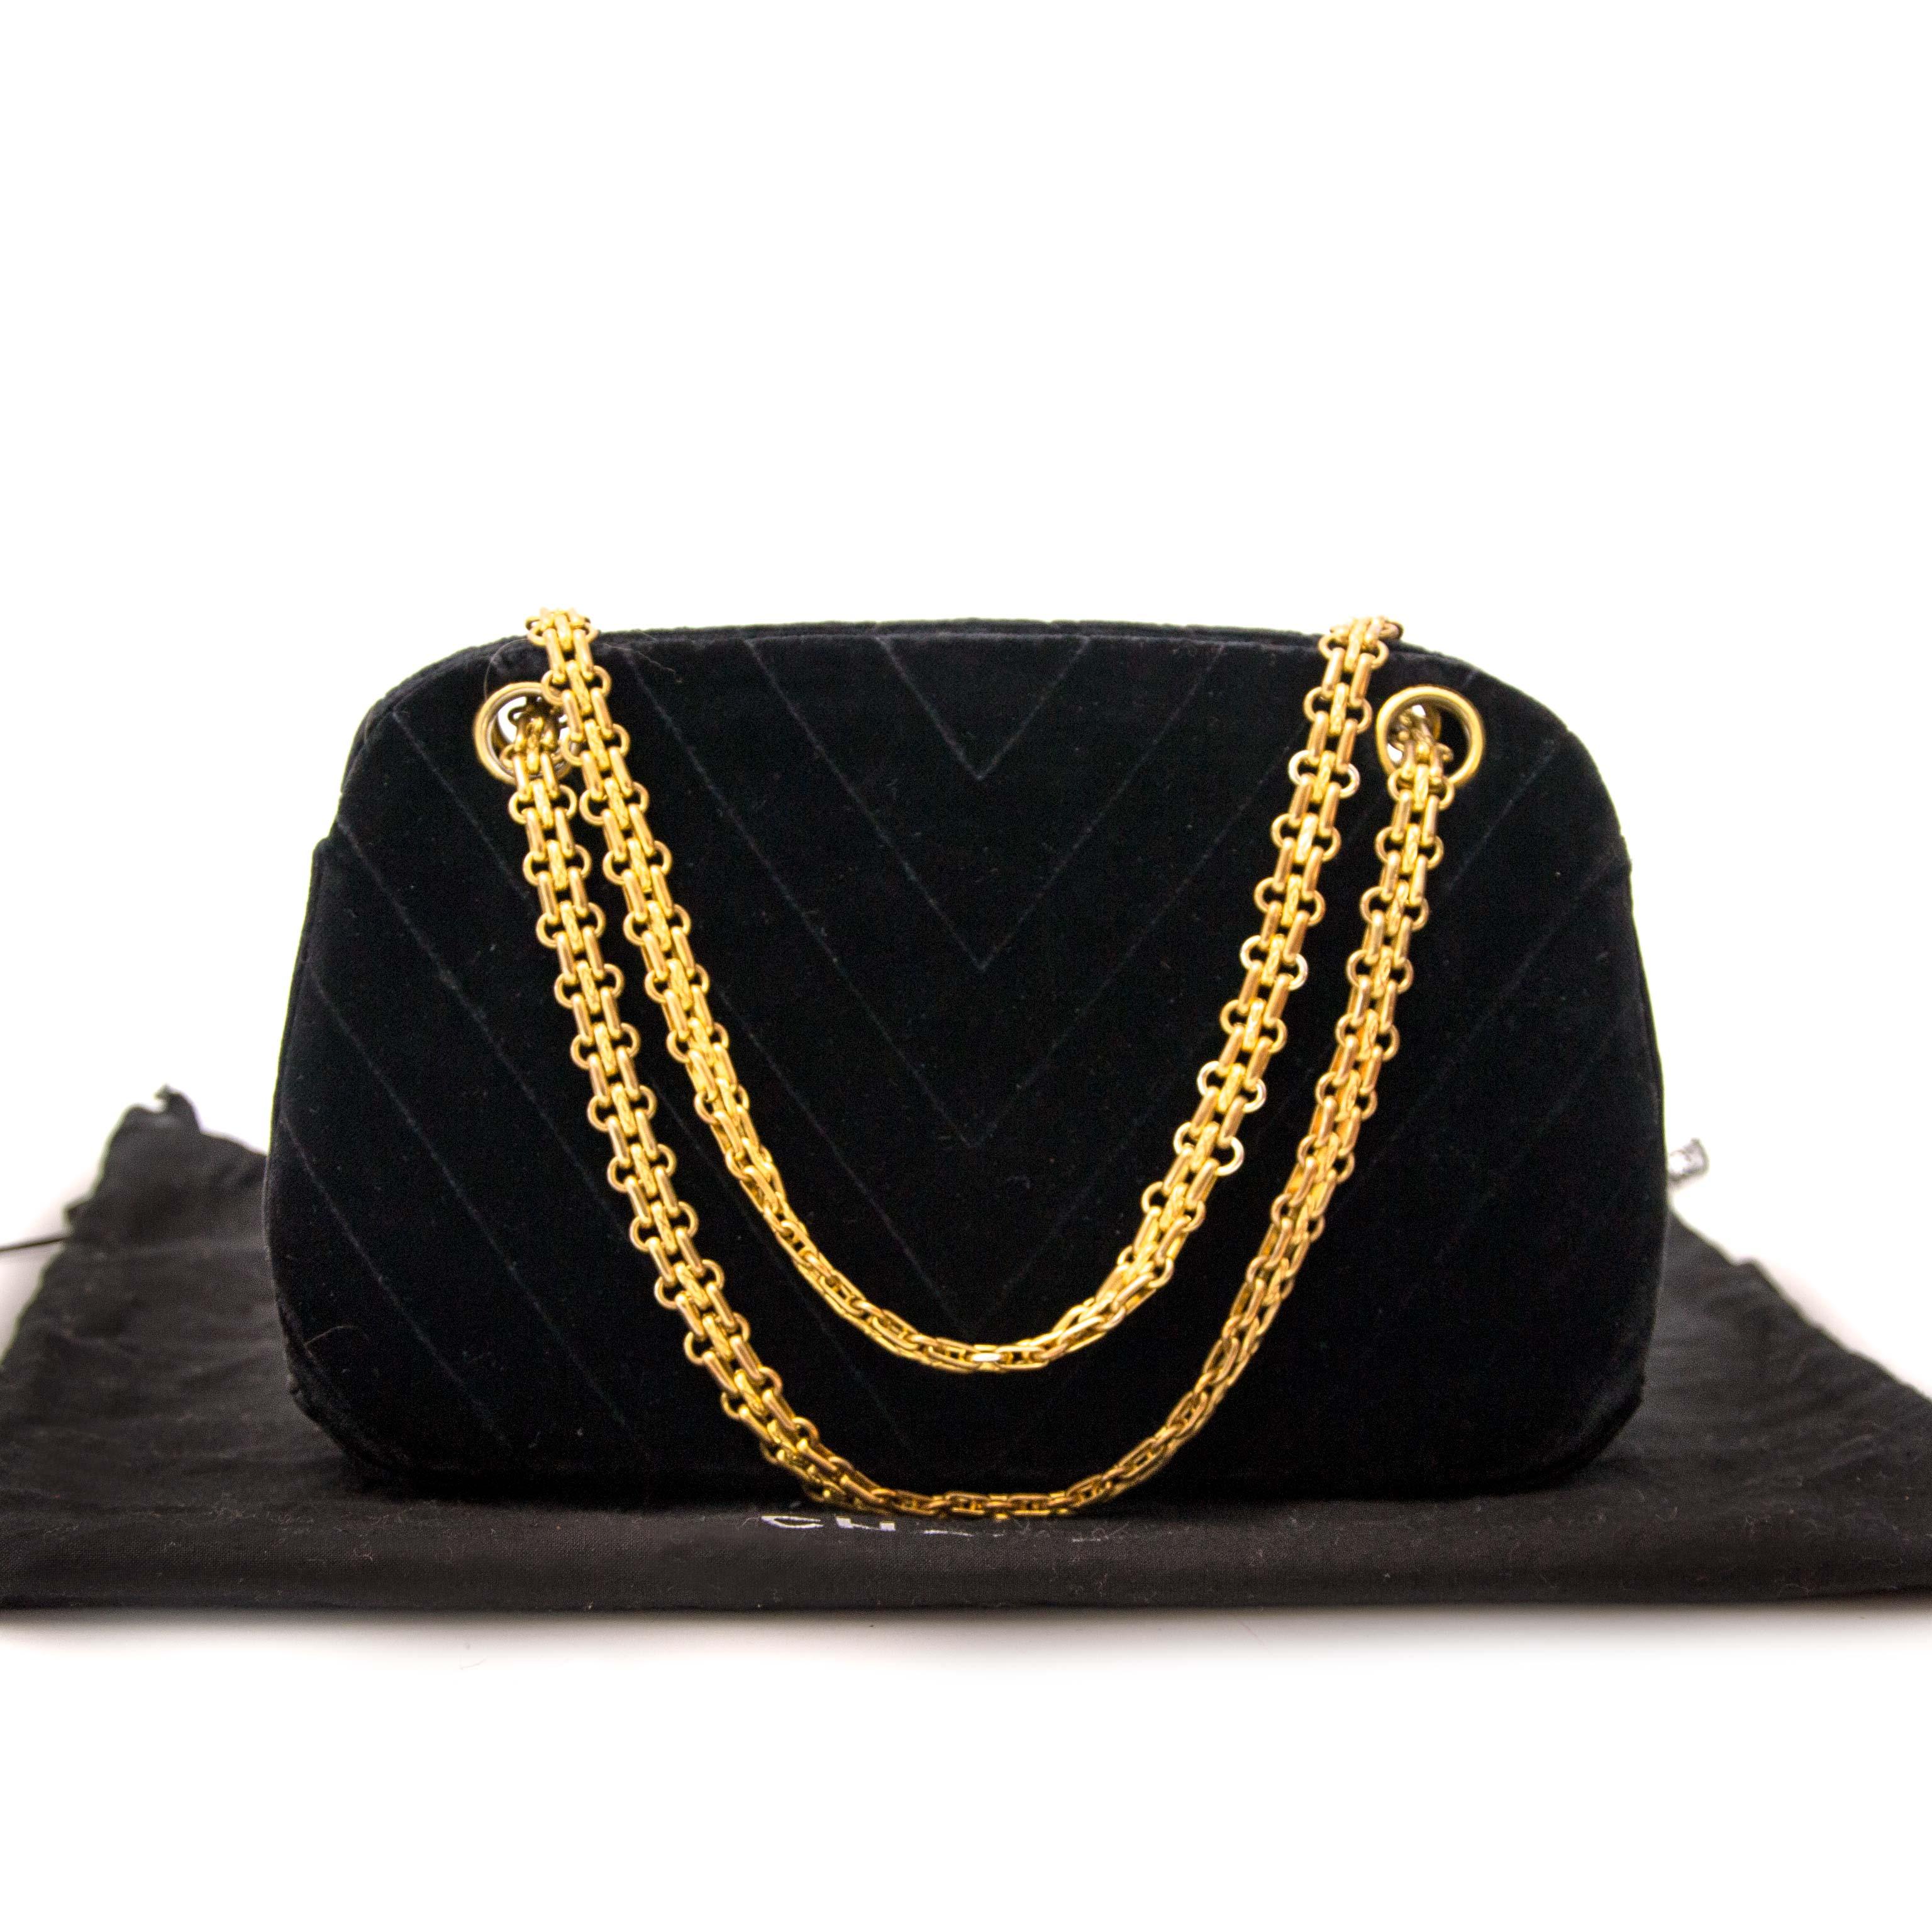 koop veilig online jou tweedehands Rare Chanel Vintage 60s Mademoiselle Quilted Velvet Bag